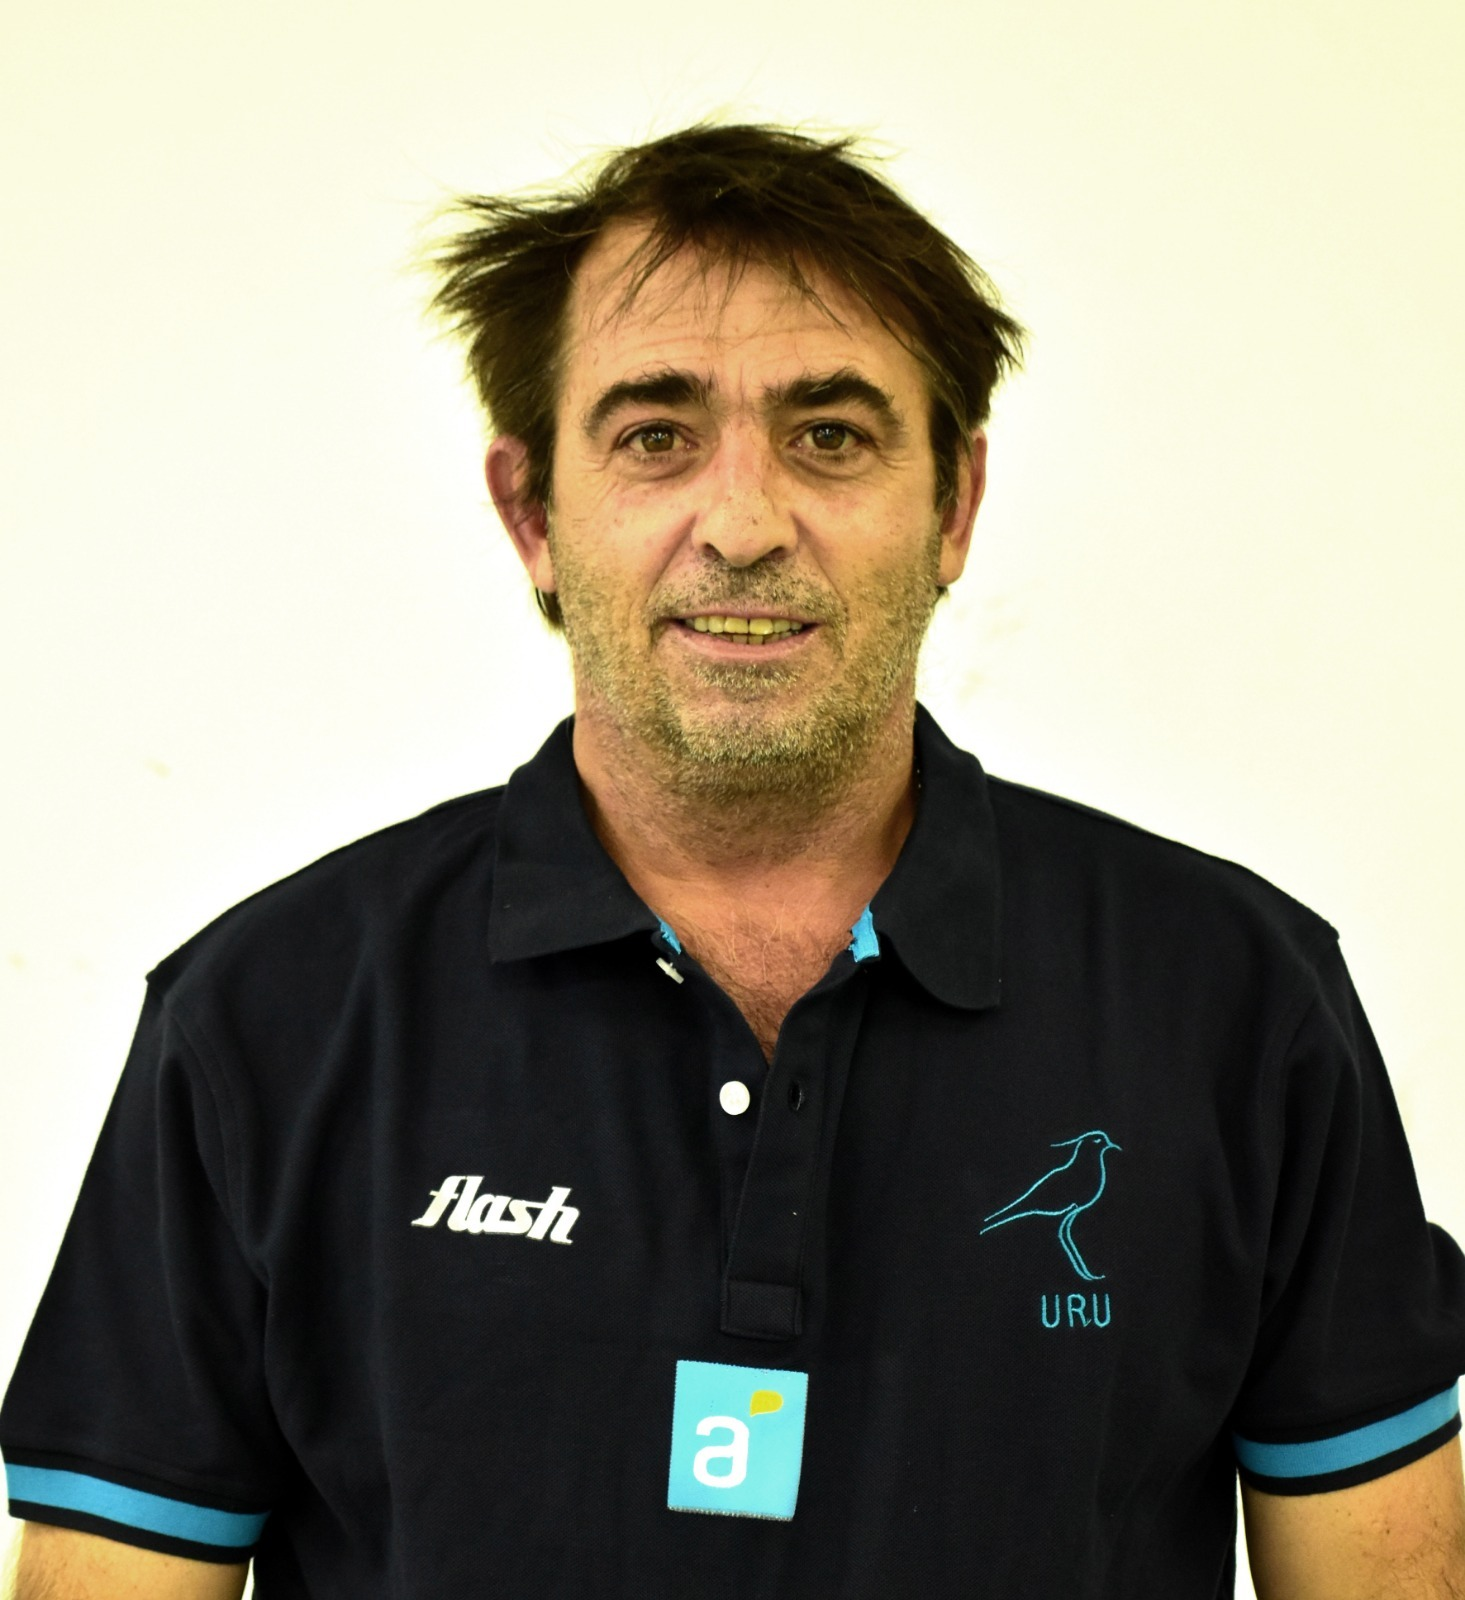 Fernando Paullier